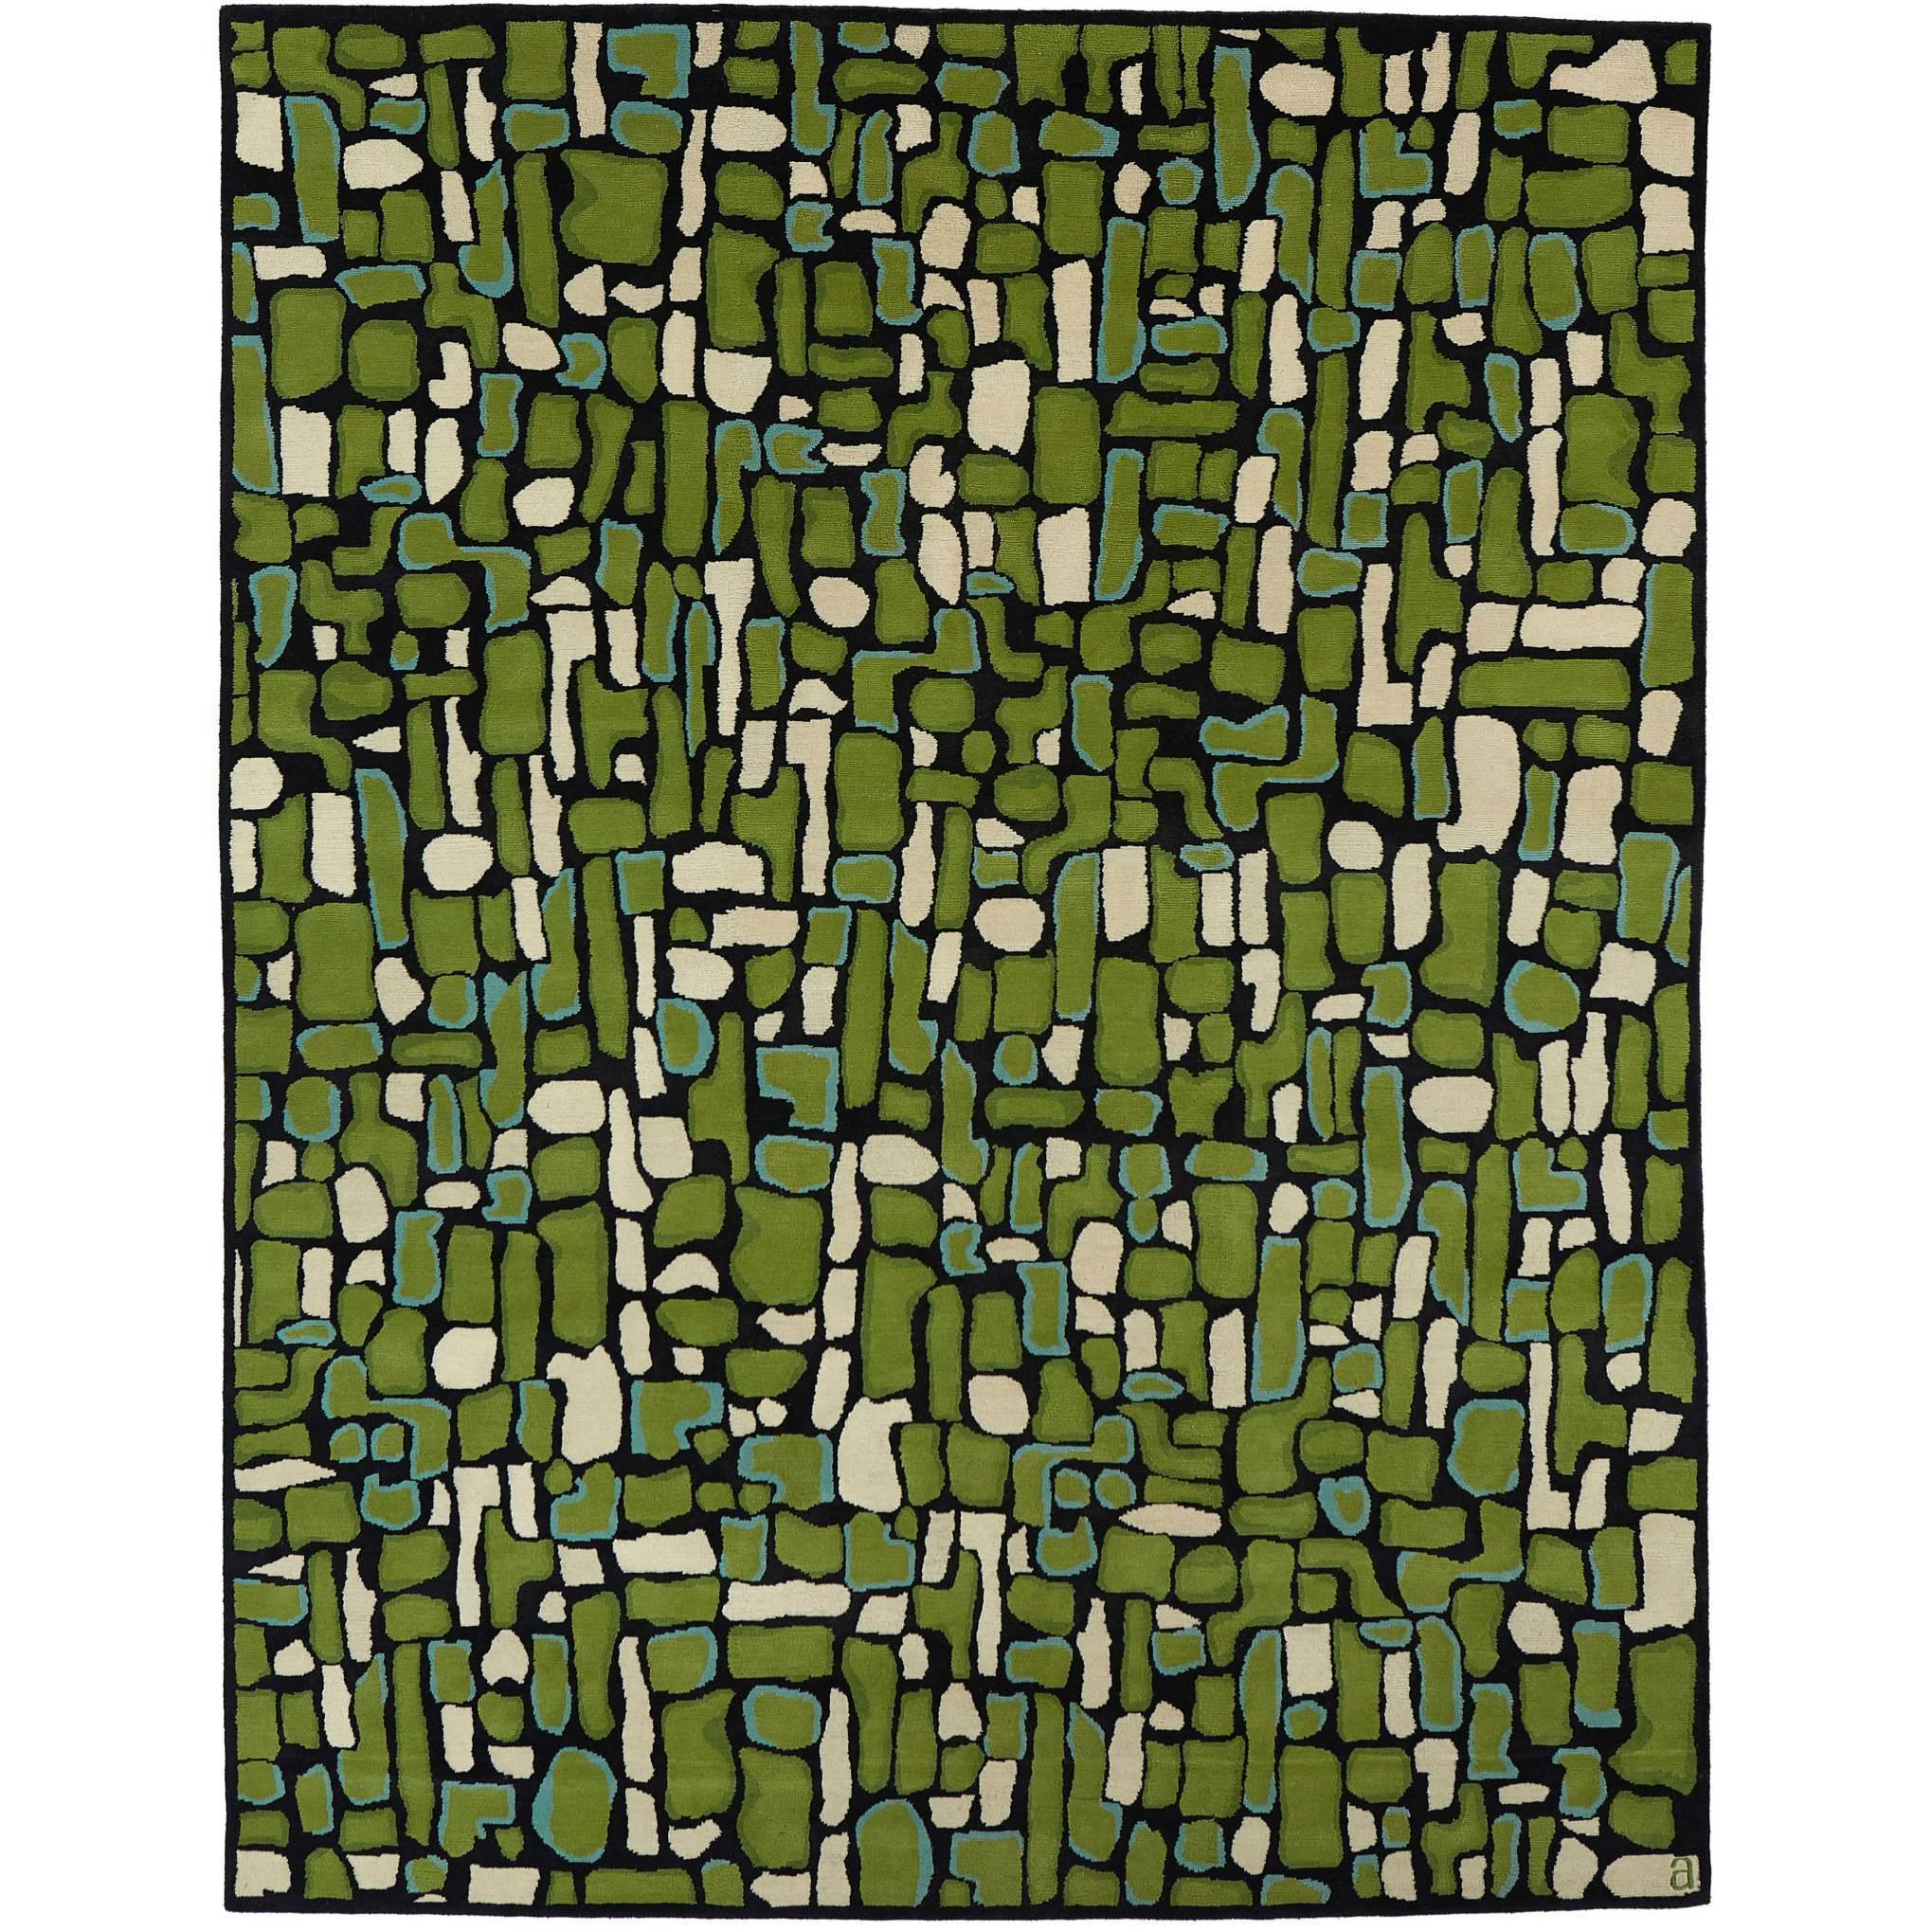 Angela Adams Pyrite, Green Rug, 100% New Zealand Wool, Hand-Knotted, Modern